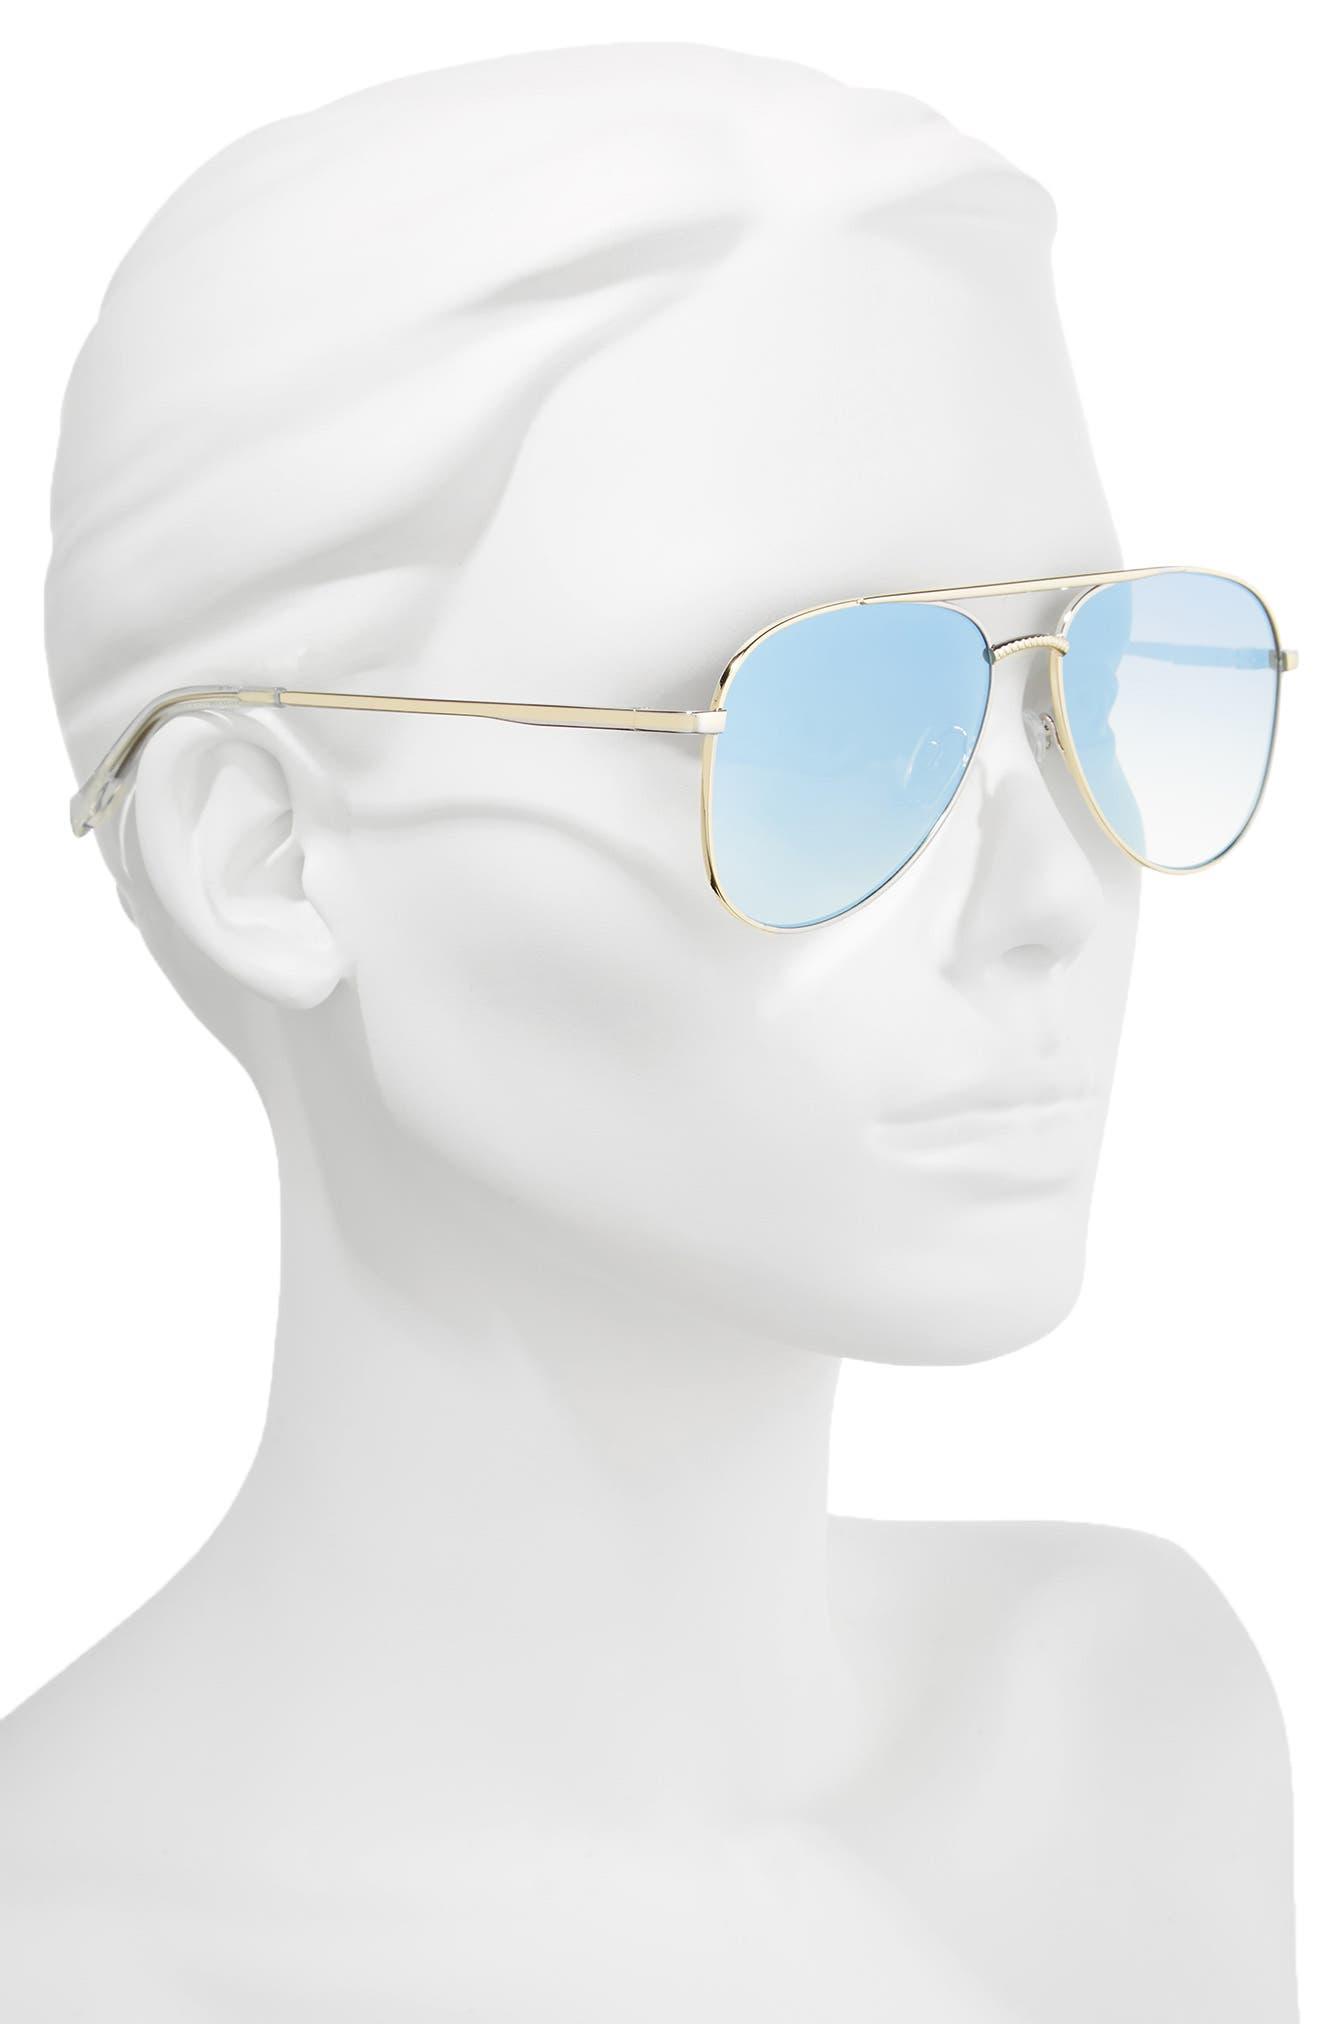 Kingdom 57mm Polarized Aviator Sunglasses,                             Alternate thumbnail 5, color,